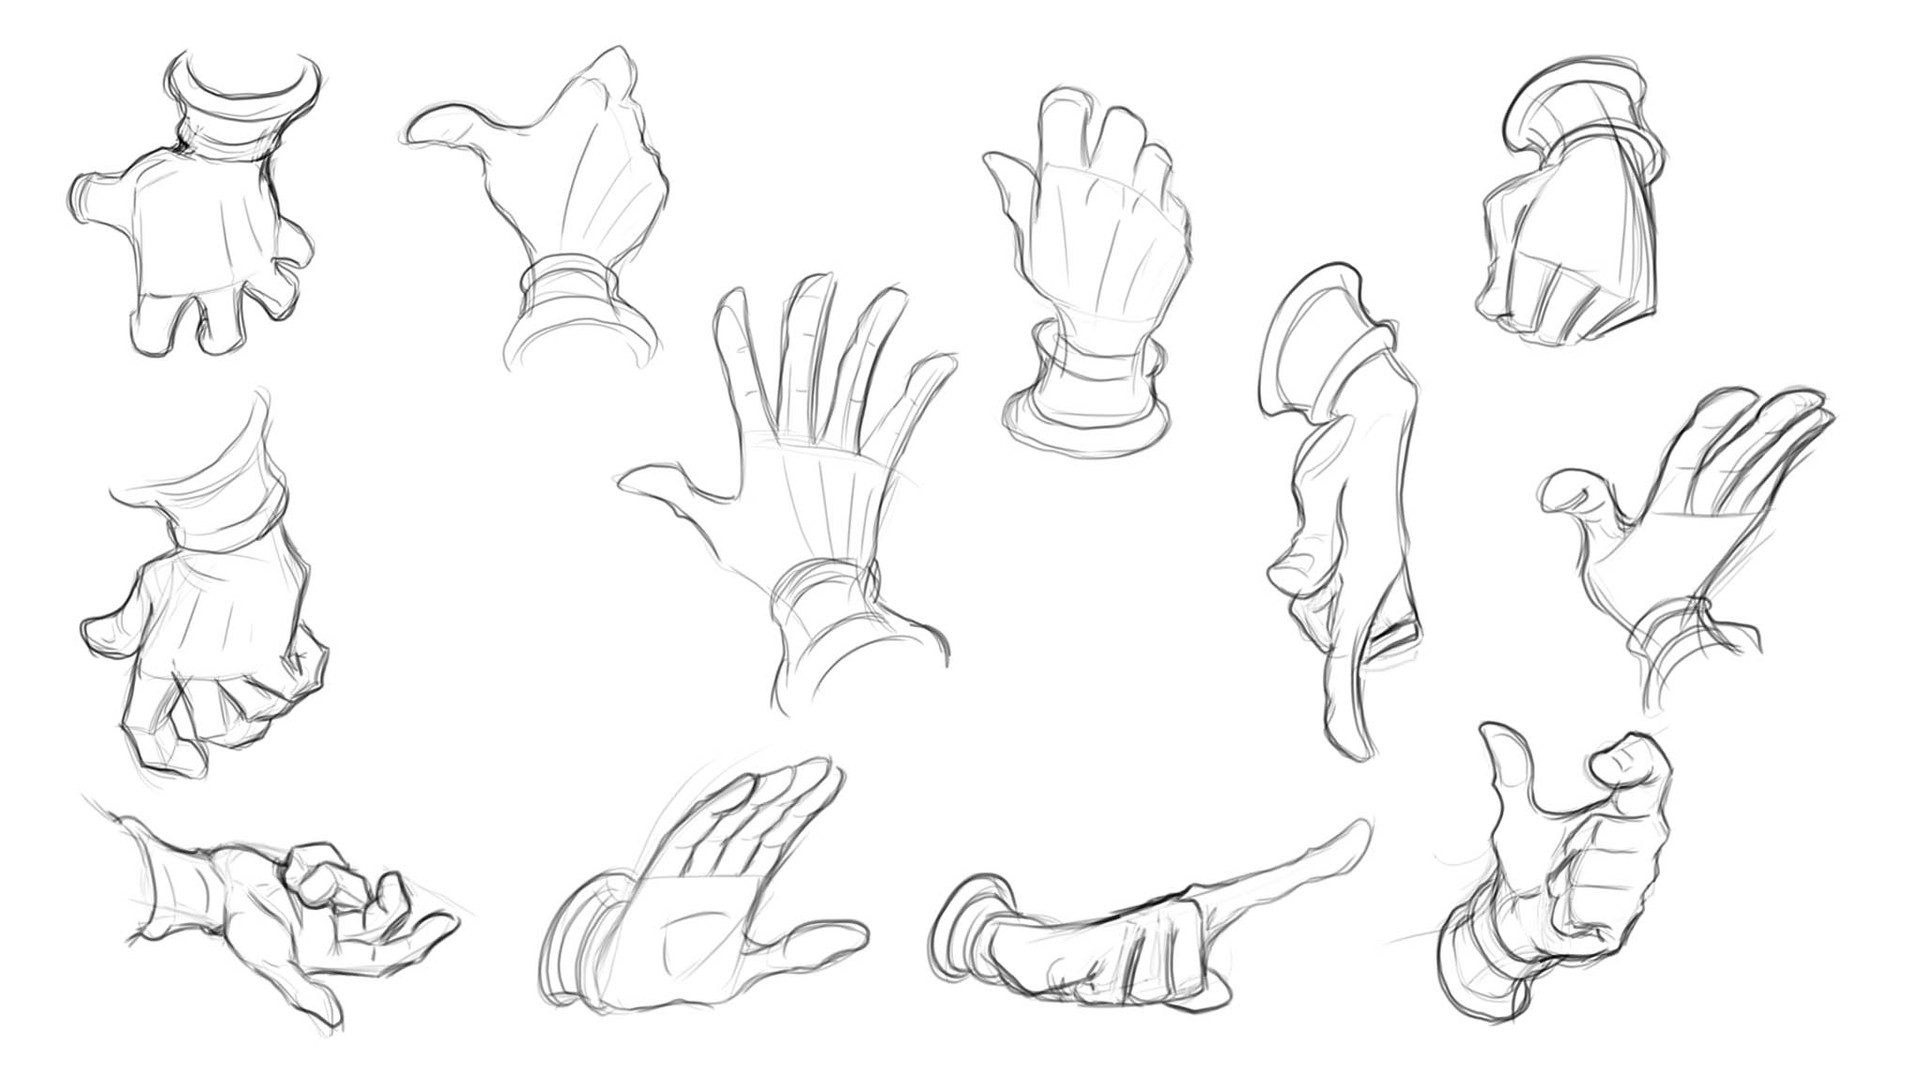 artstation anatomy sketches dustin newman Ashley Greene 1920 X 1080 scroll to see more